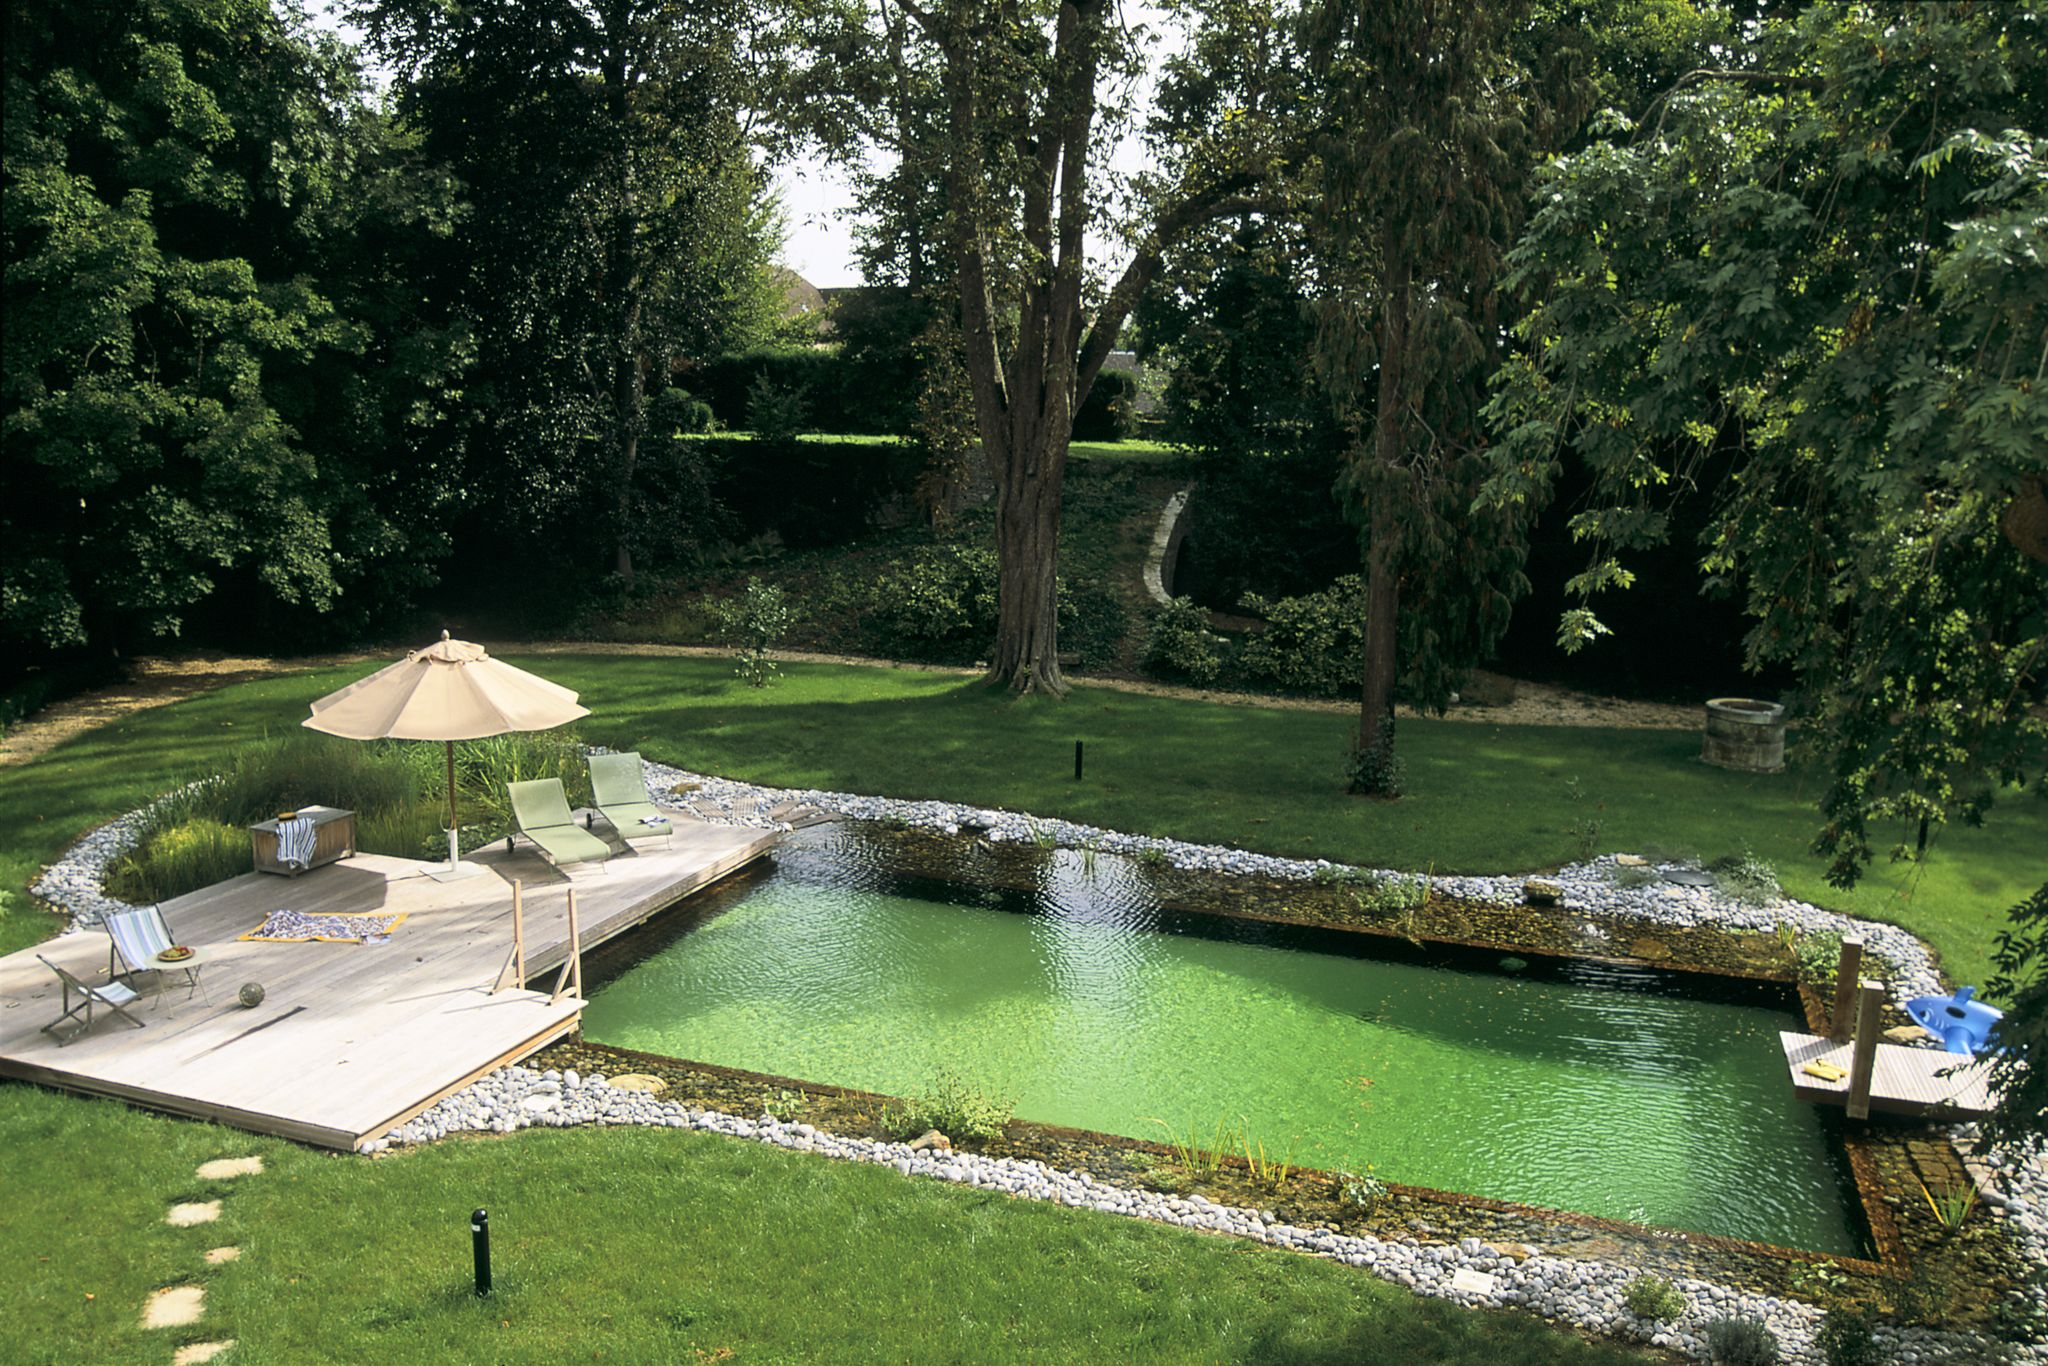 maillard paysage aménagement piscine oise